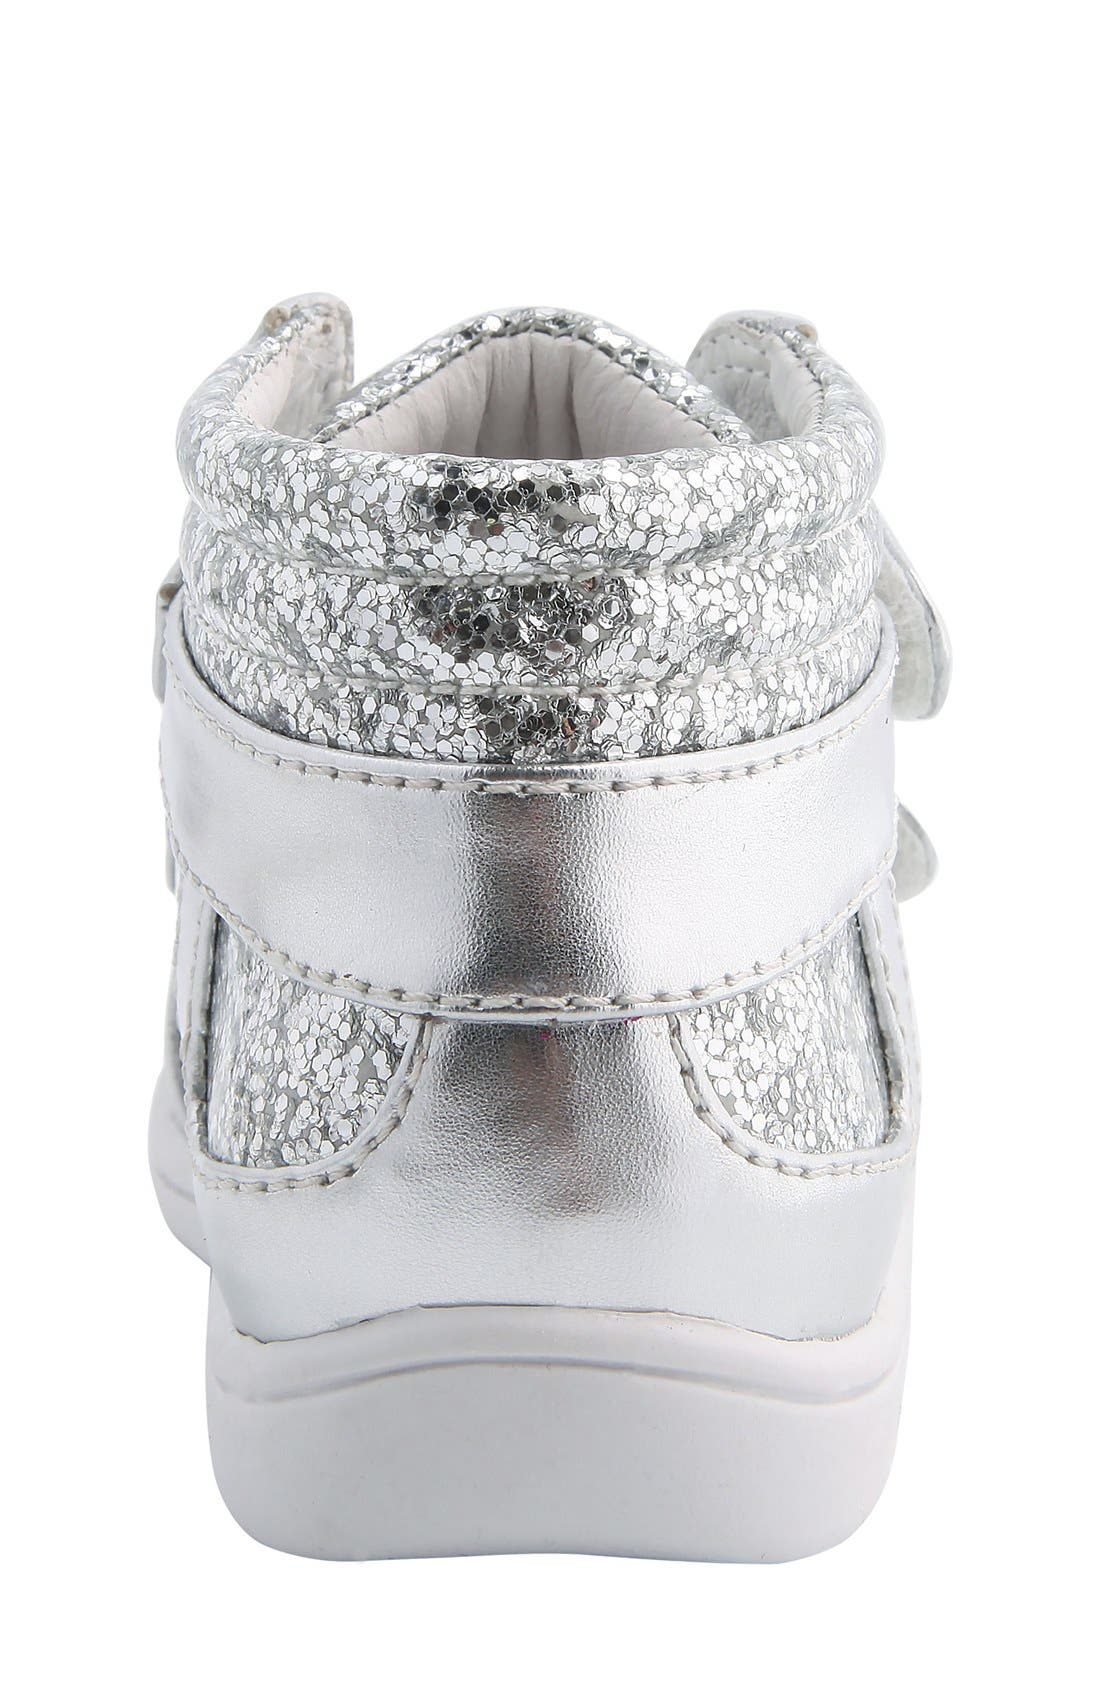 Nina 'Stardust' Metallic High Top Sneaker,                             Alternate thumbnail 4, color,                             047